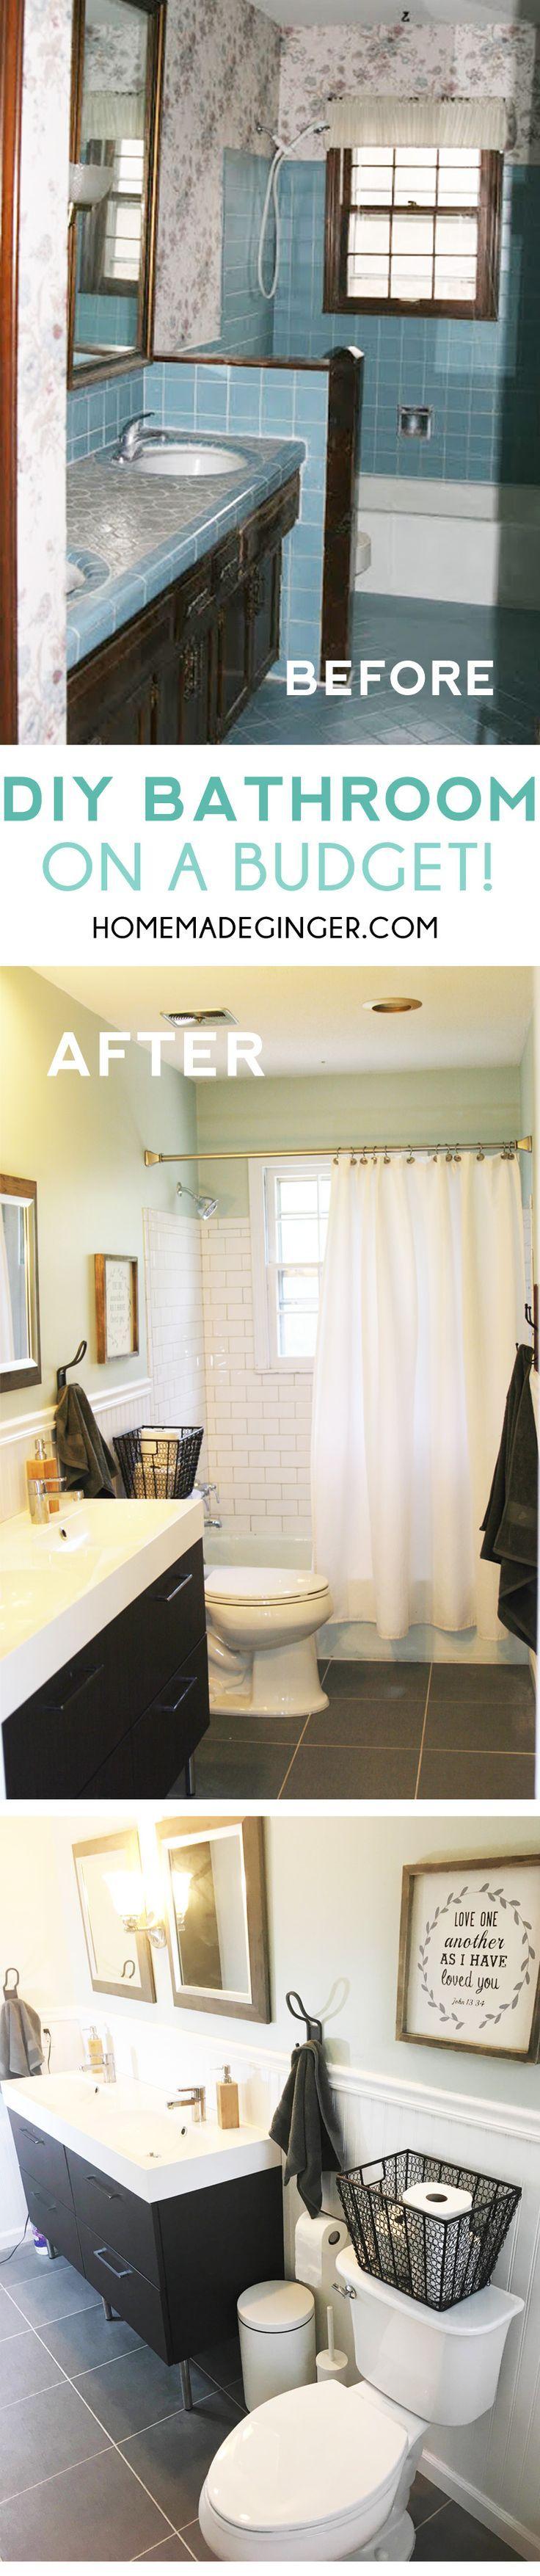 205 best Bathroom DIY Home Decor images on Pinterest